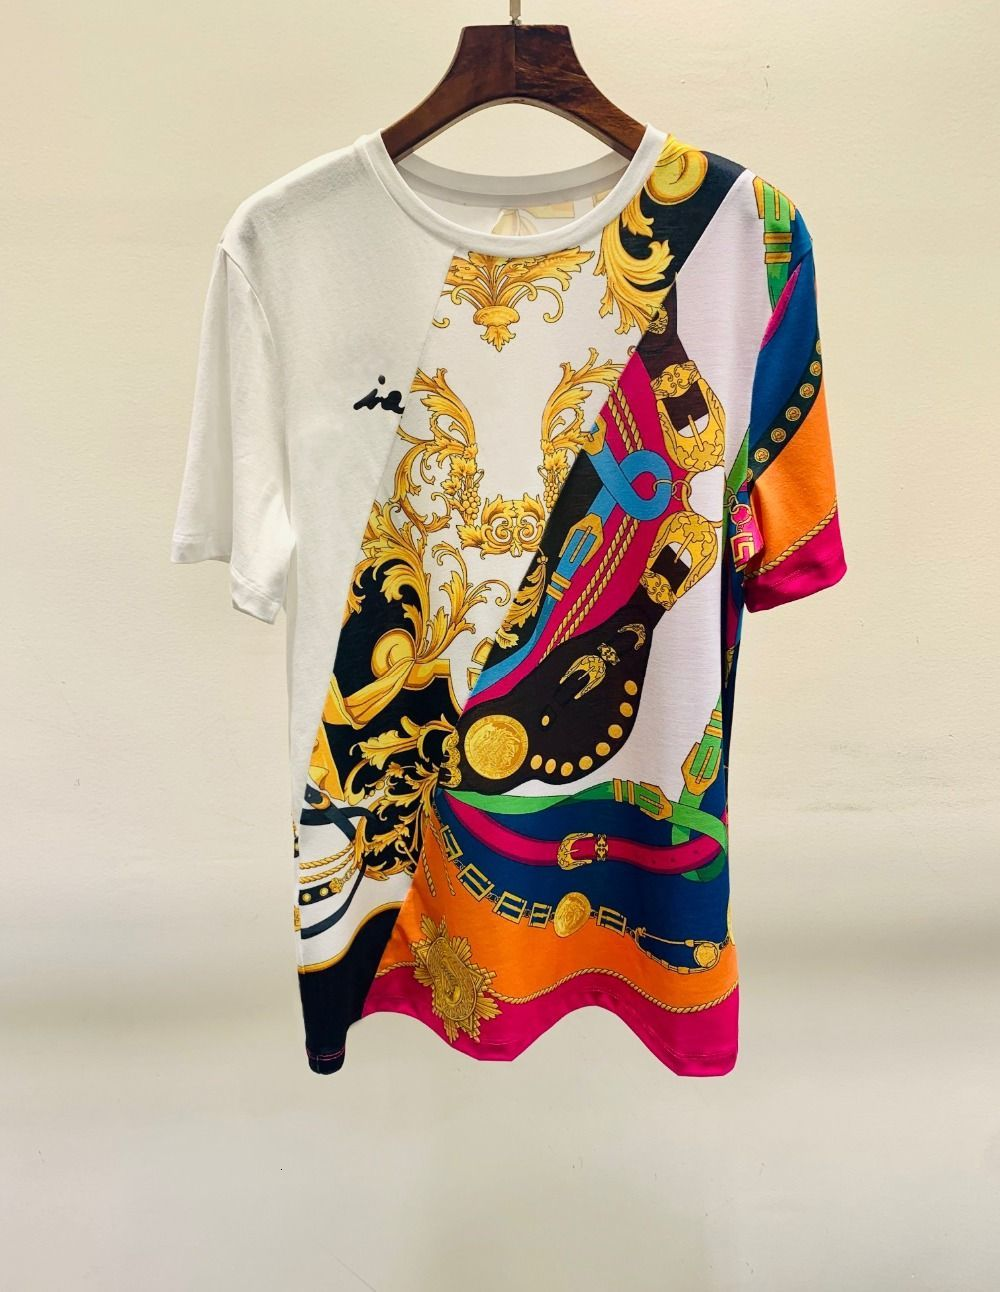 2021 Summer White Woman Graphics T-shirt Designer Luxury Women's Clothes Ebb9